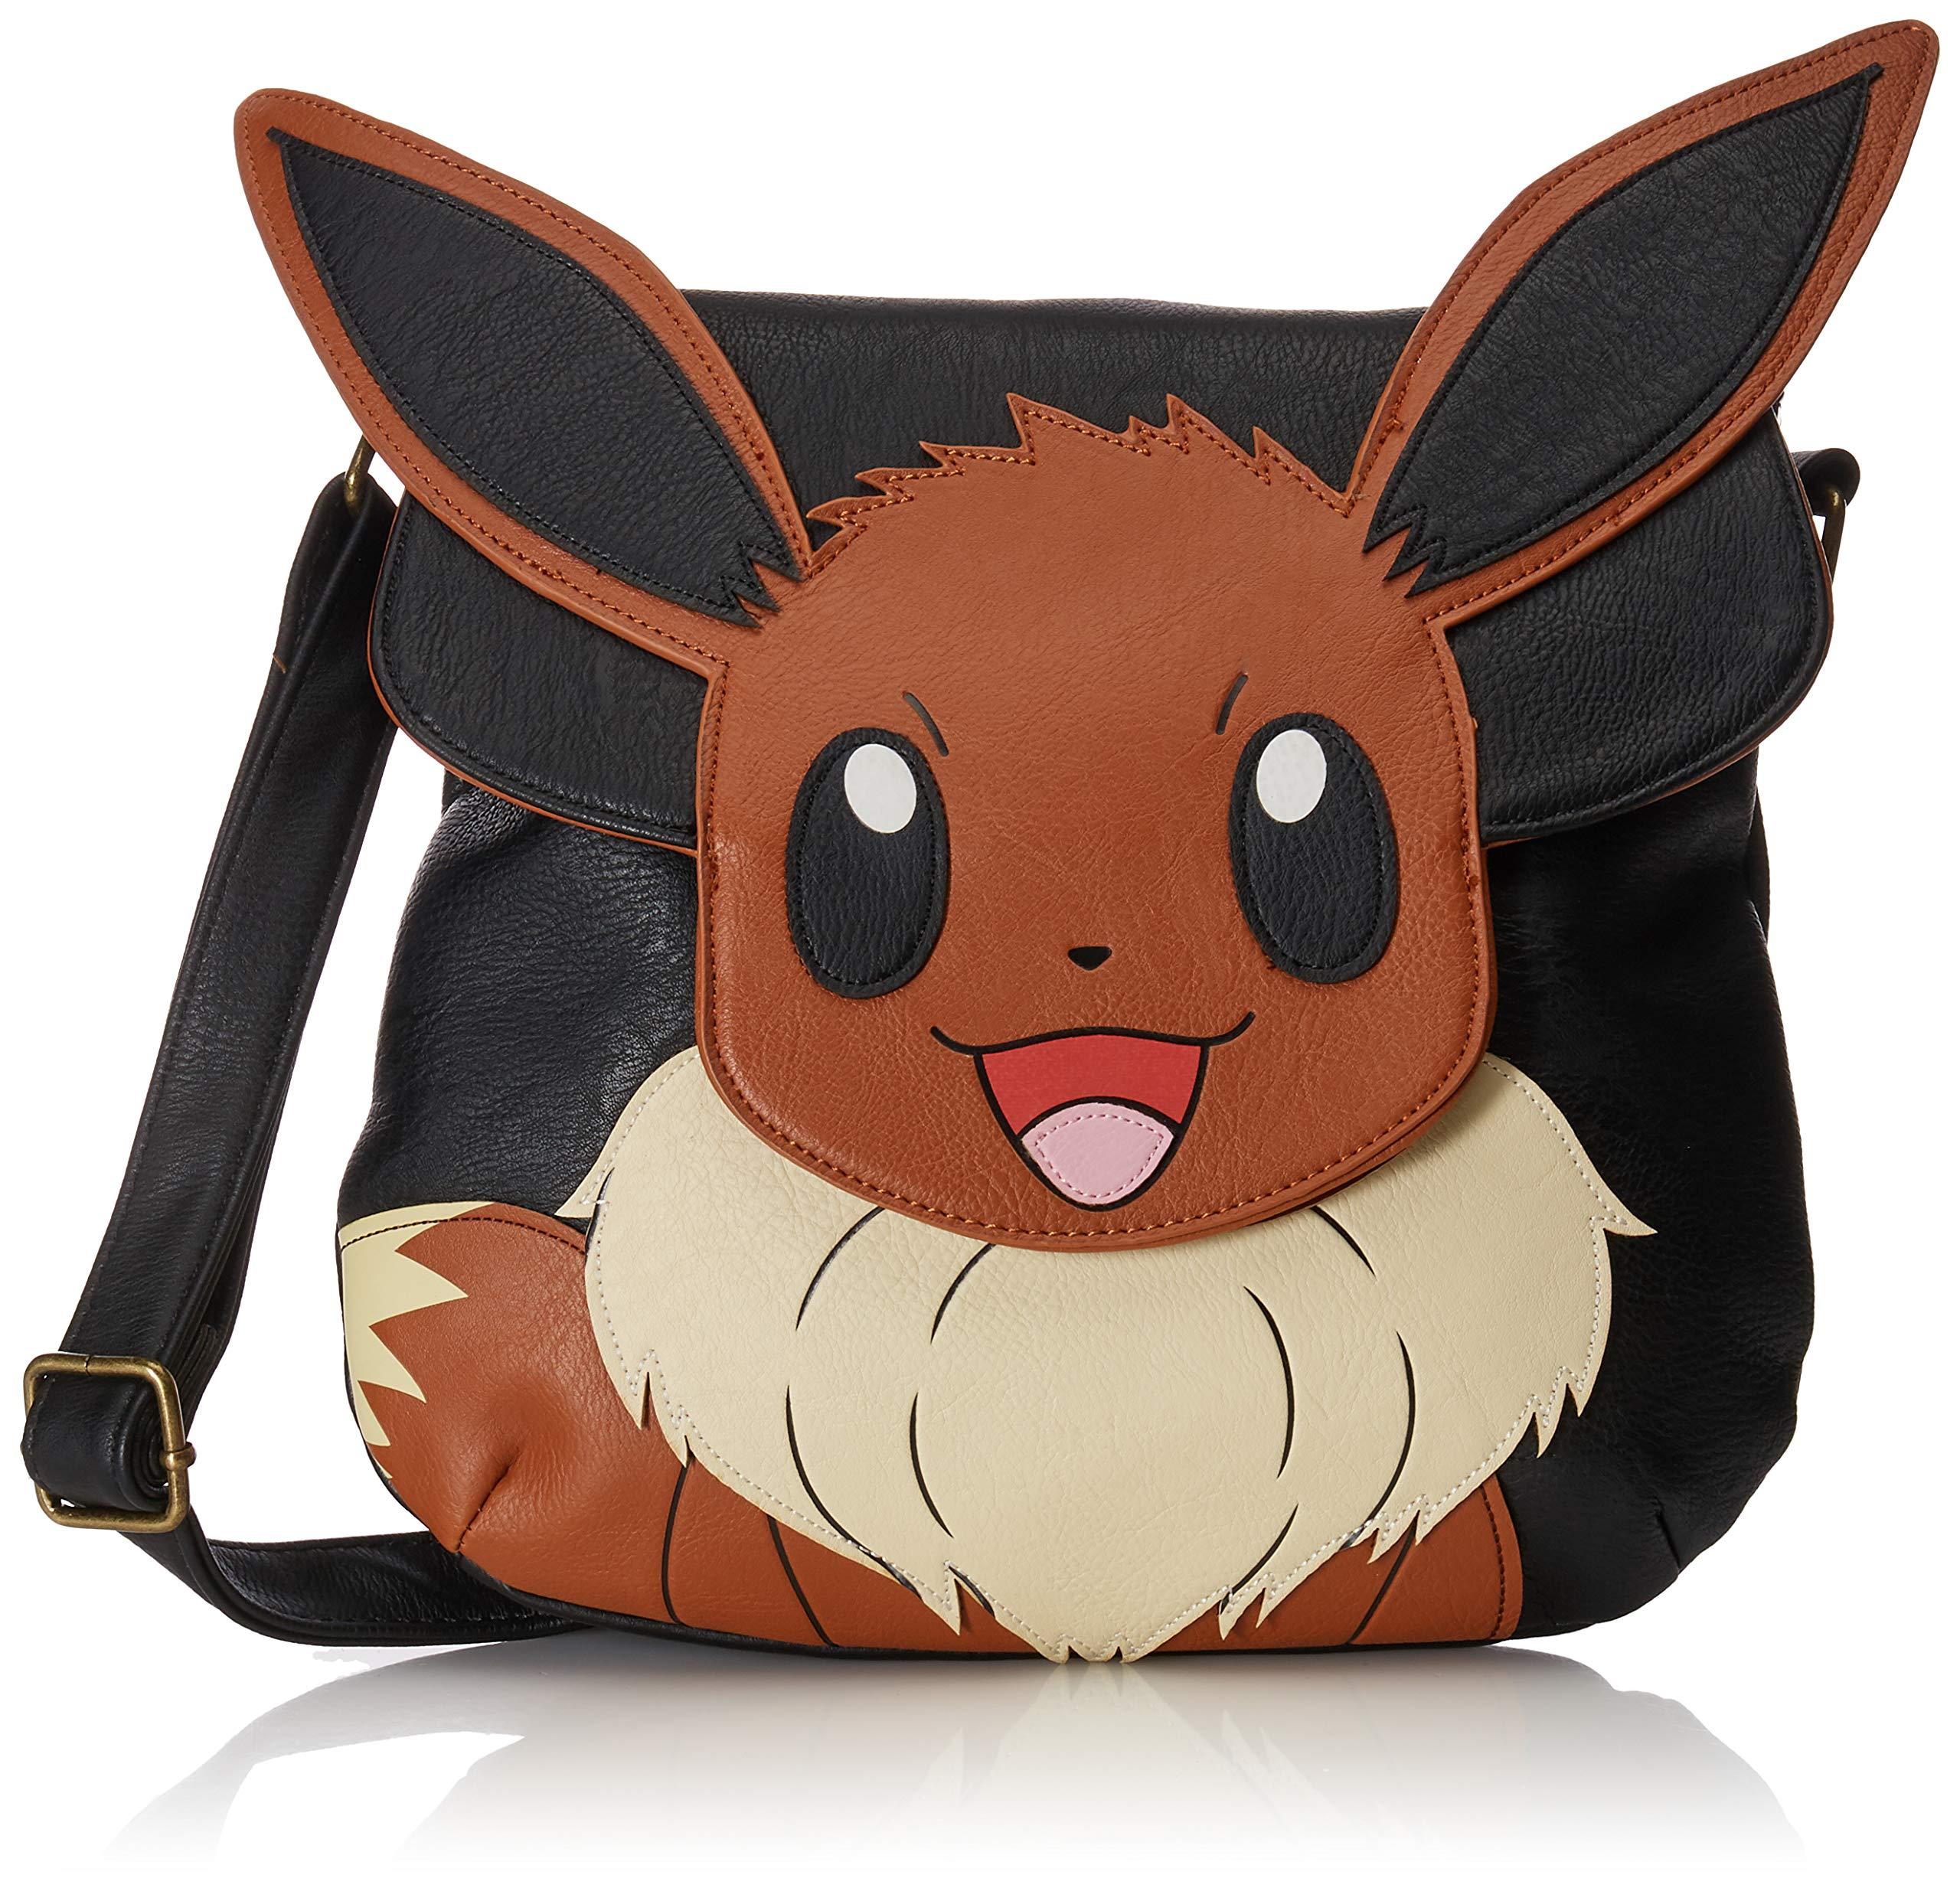 Loungefly Pokemon Eevee Crossbody Bag by Loungefly